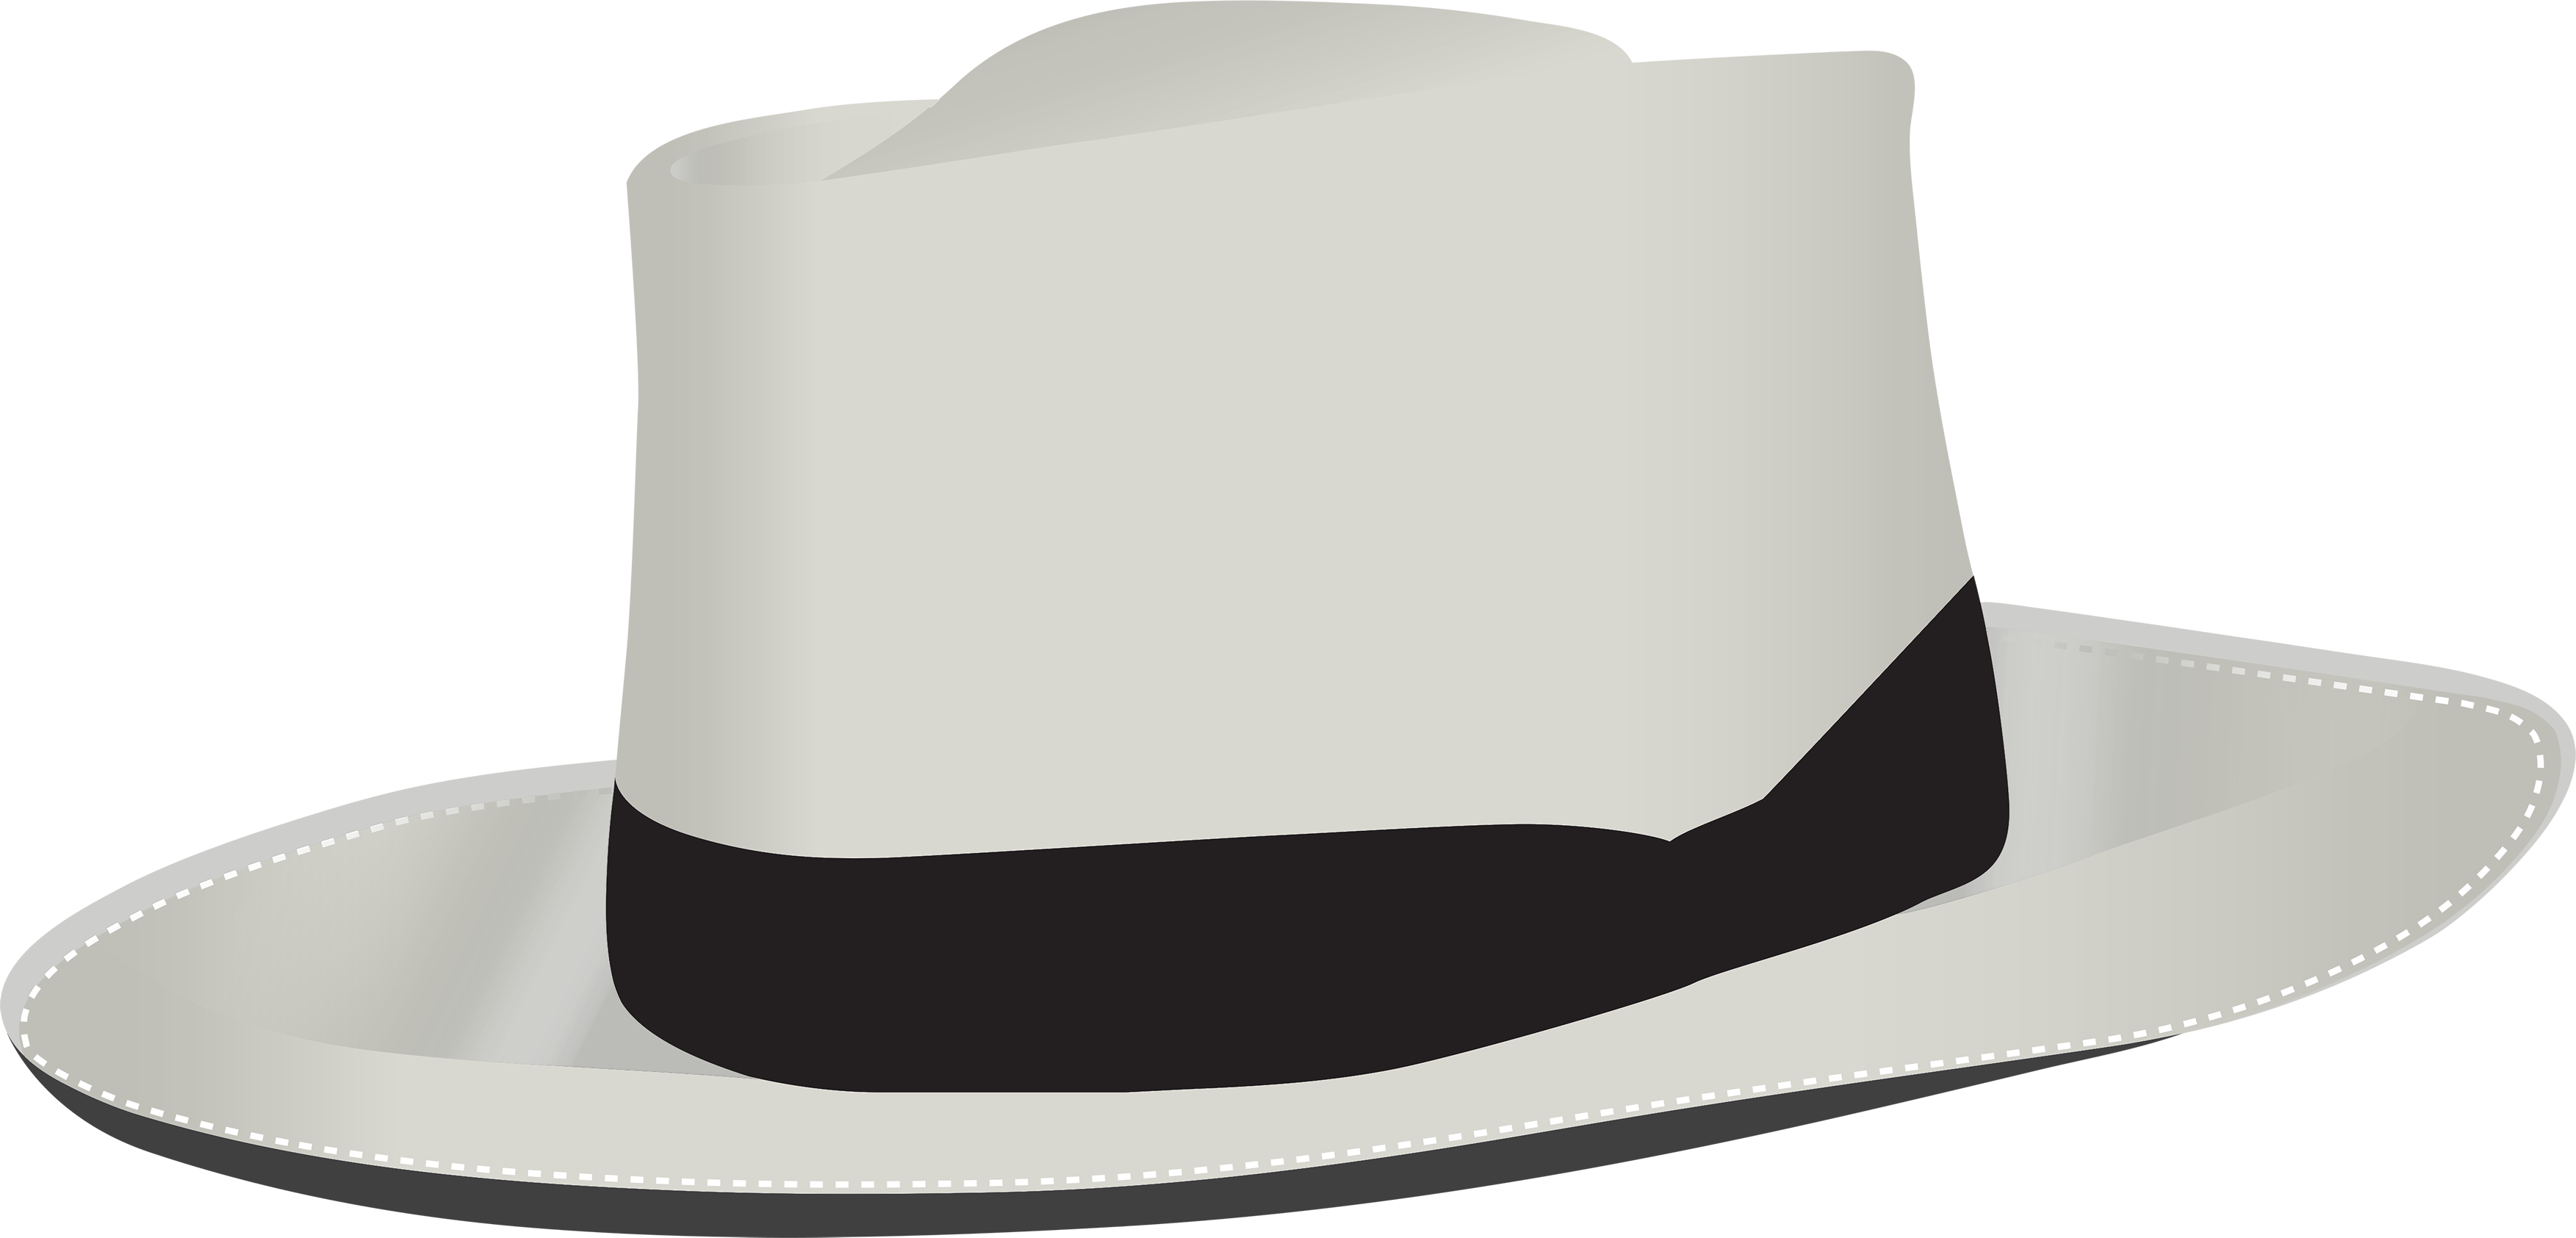 White Hat Png Image Clip Art White Hat Free Clip Art